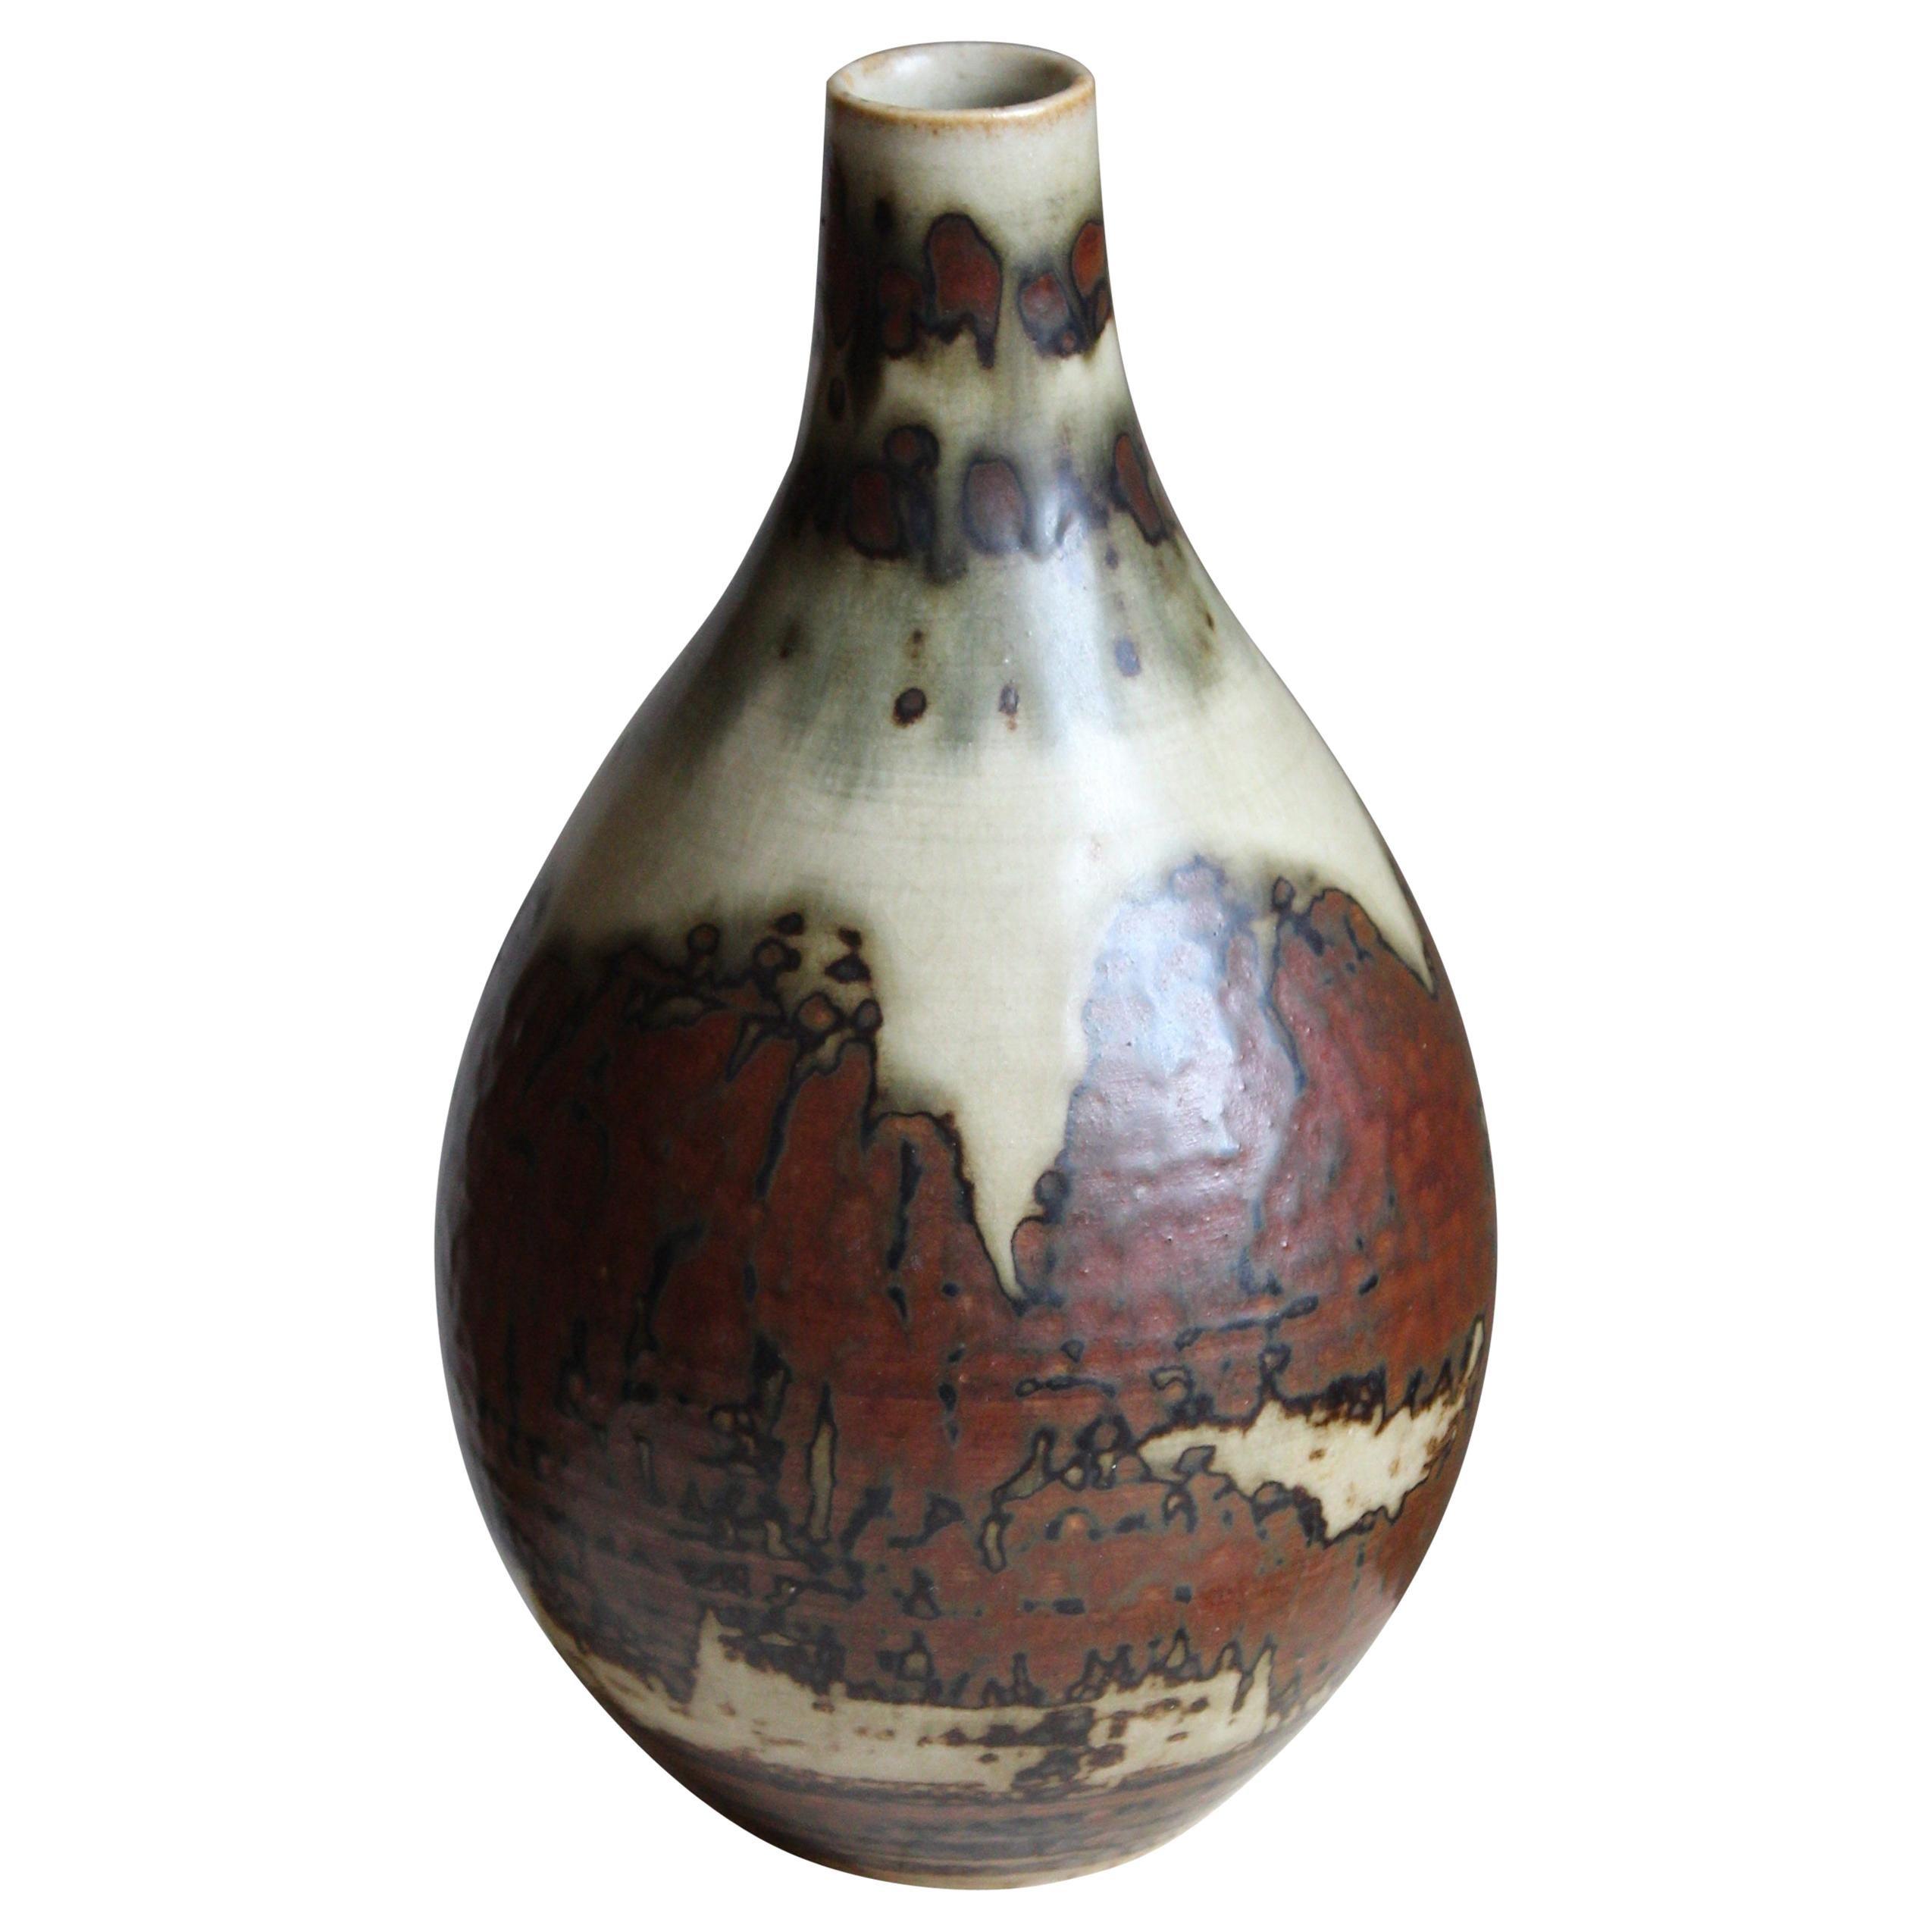 Carl Halier, Vase, Glazed Stoneware, Royal Copenhagen, 1950s